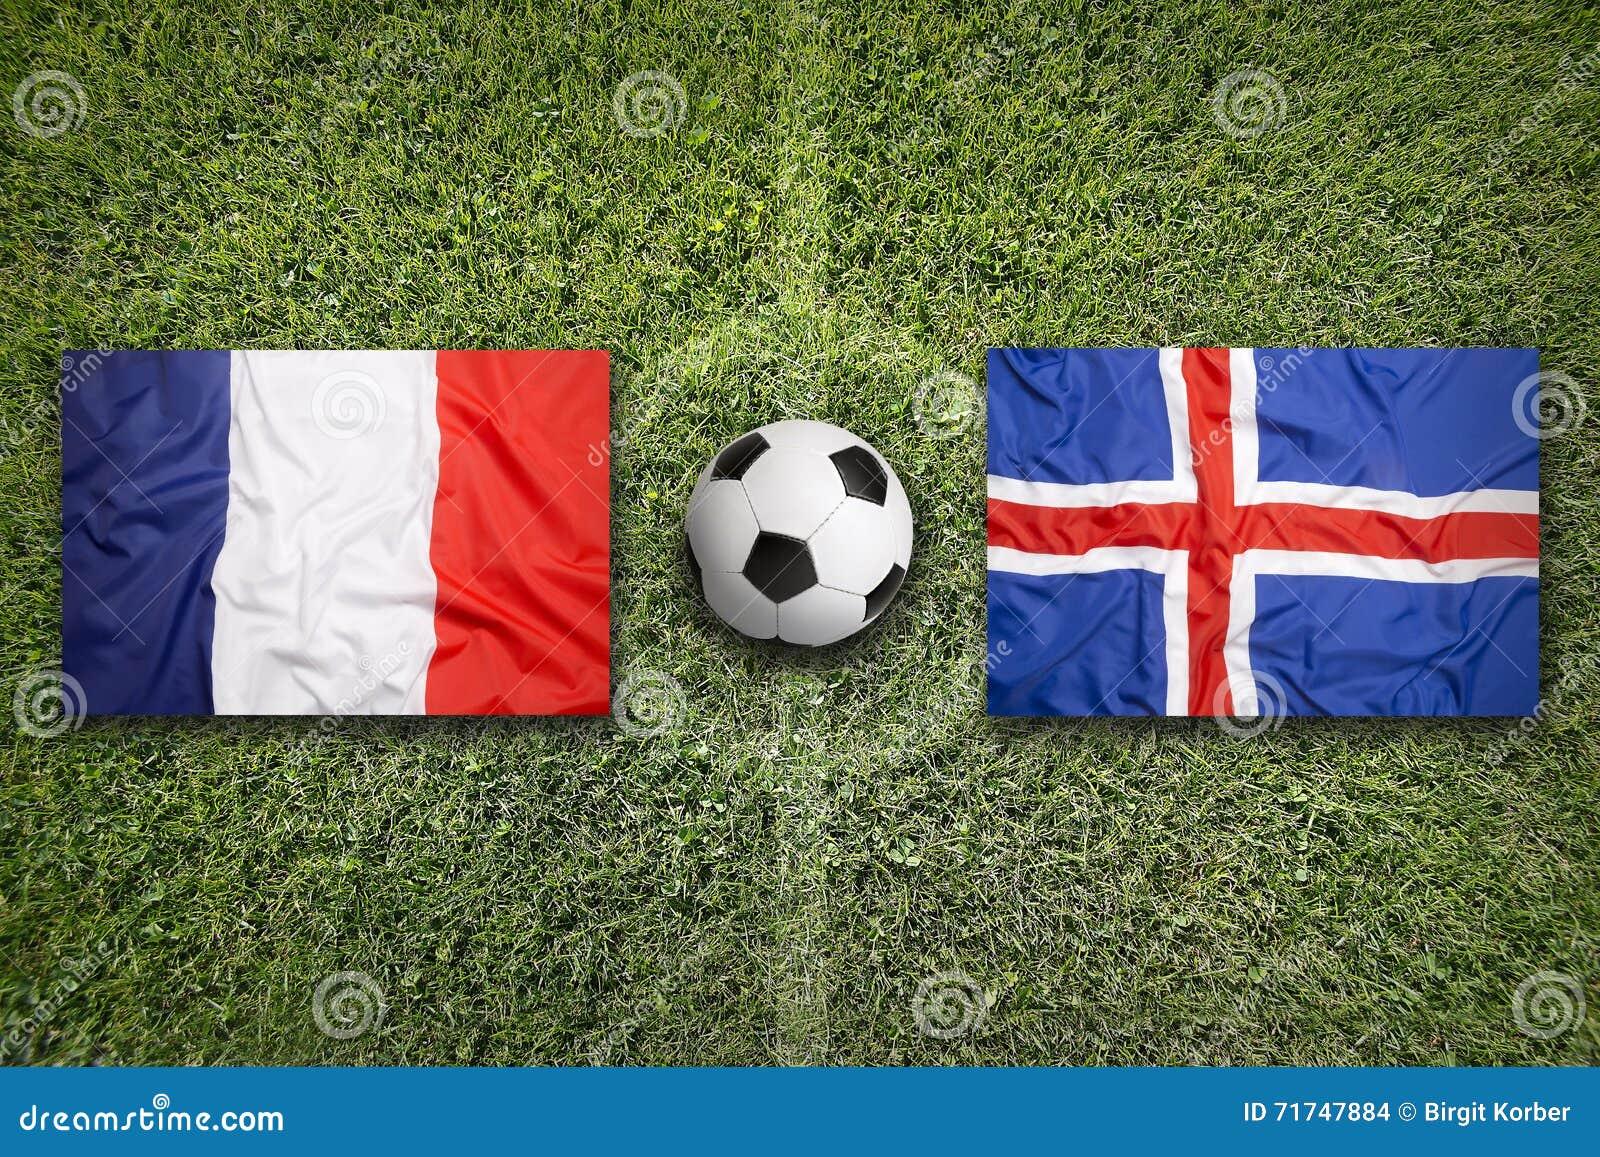 france vs iceland - photo #18